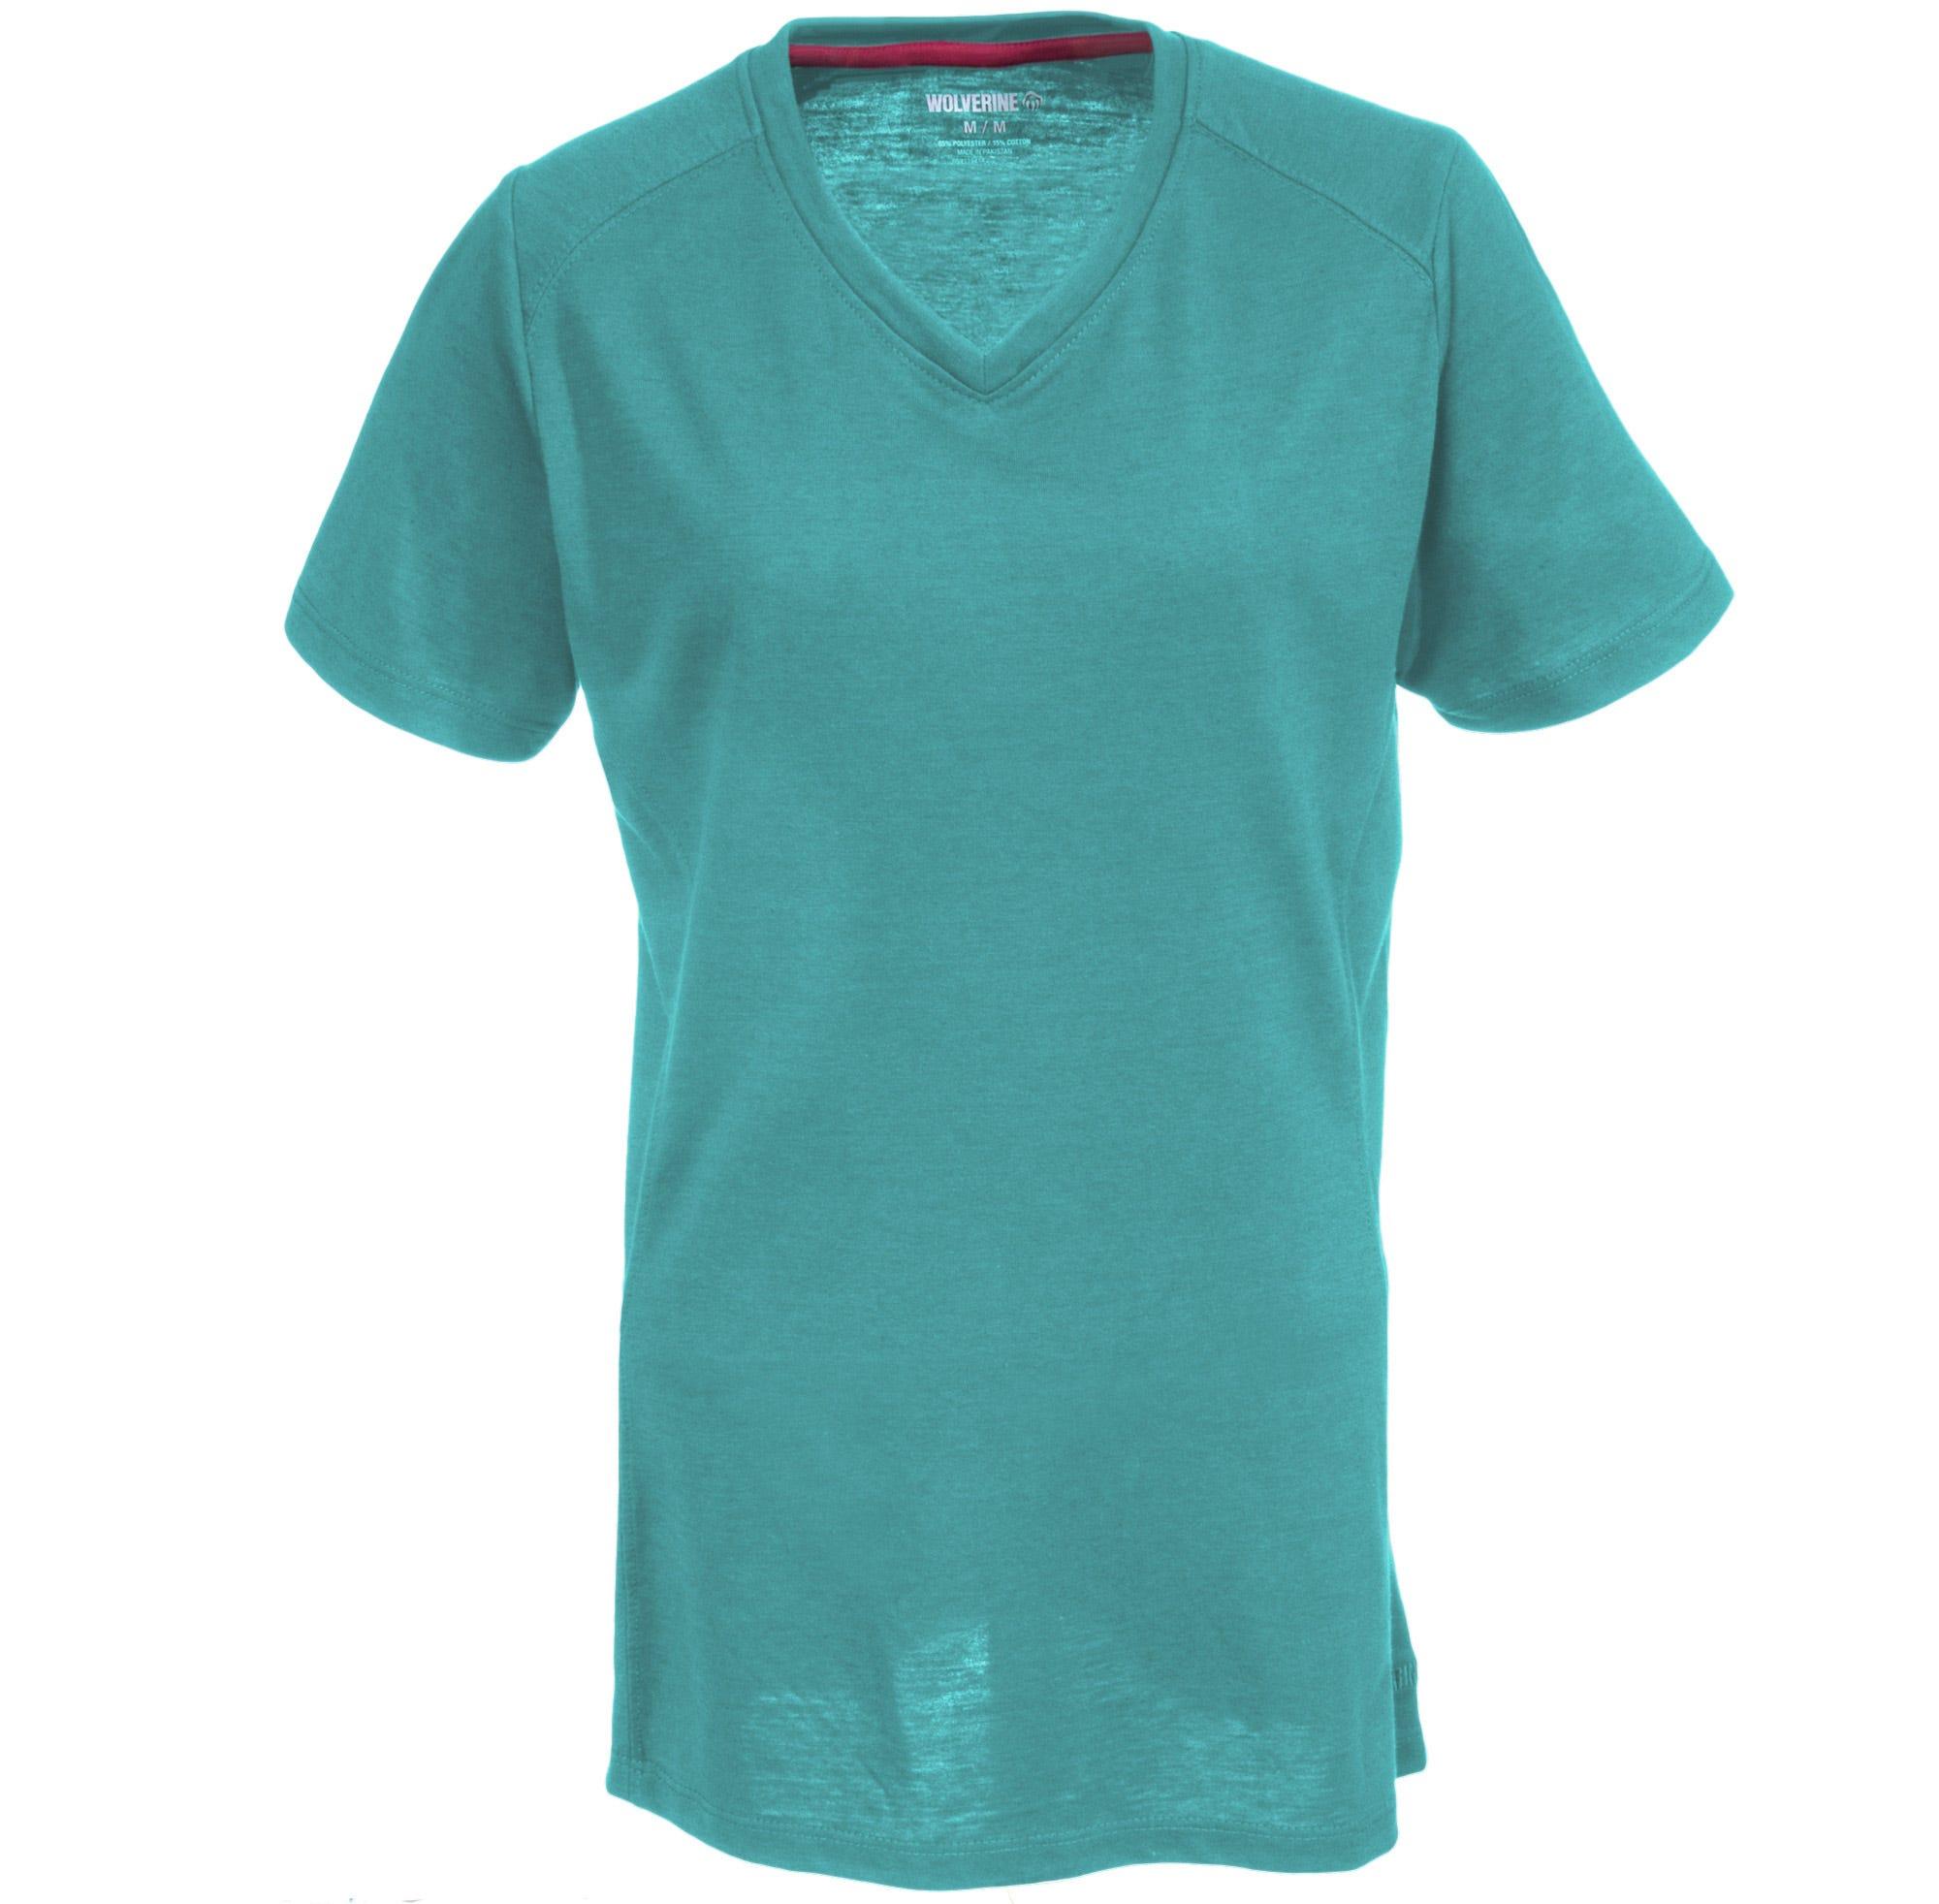 Wolverine Women's W1204590 463 Blue Piper Short Sleeve Tee Shirt